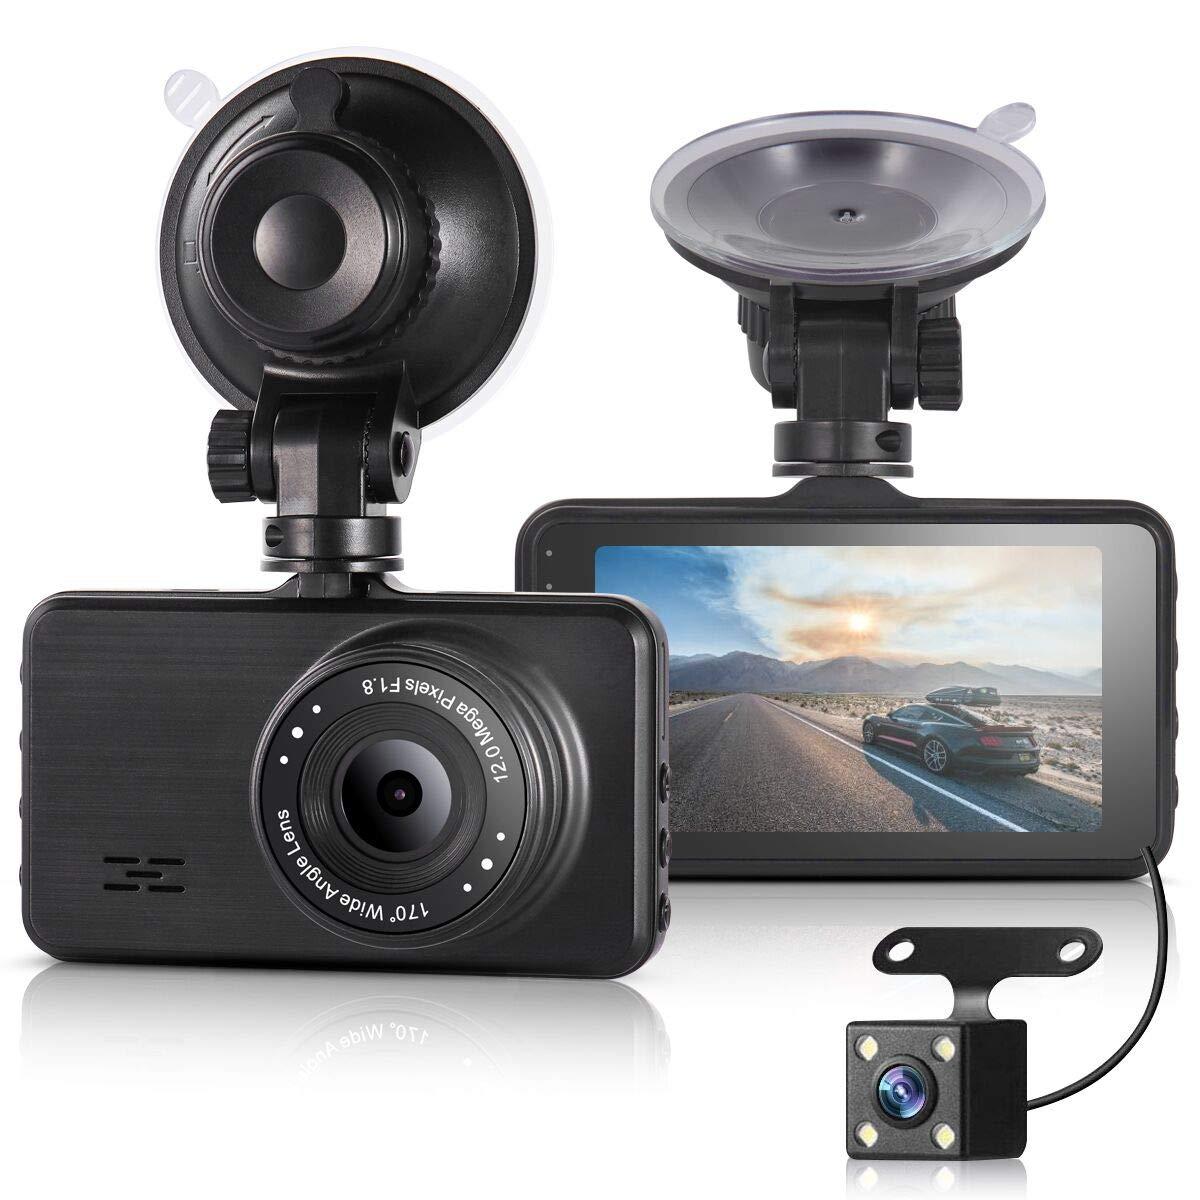 ULU Car Dash Cam FHD 1080P Front & 720P Rear Dual Camera 170° +120° Digital Dashboard Camera Car DVR with 3 inch IPS Screen Night Vision G-Sensor Parking Monitor WDR Loop Recording